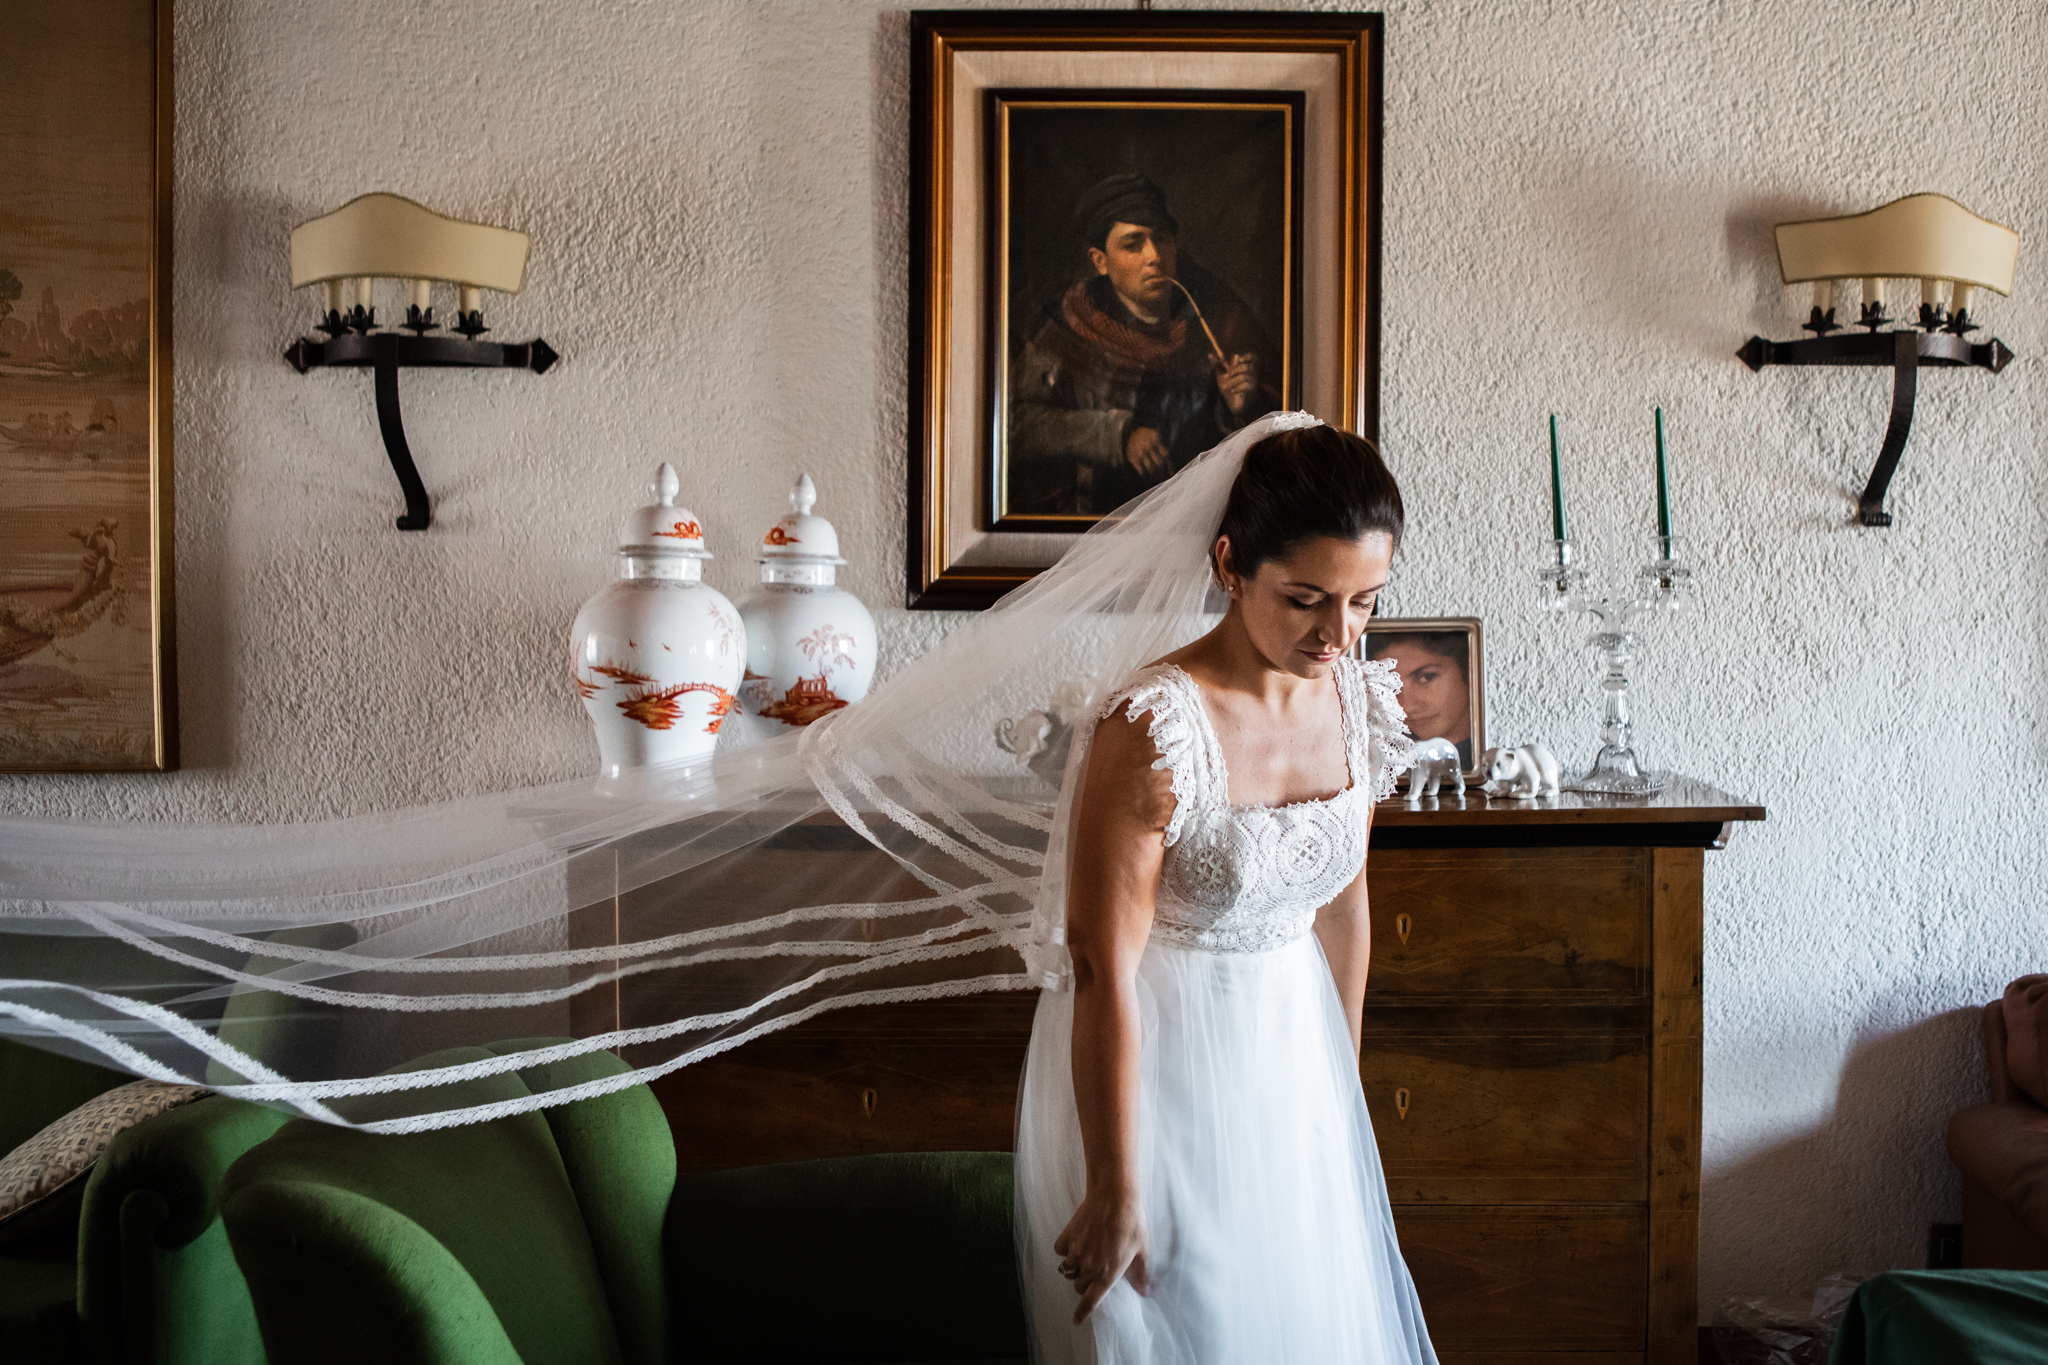 Fotografo-matrimonio-reportage-Sicilia-Catania-12.jpg